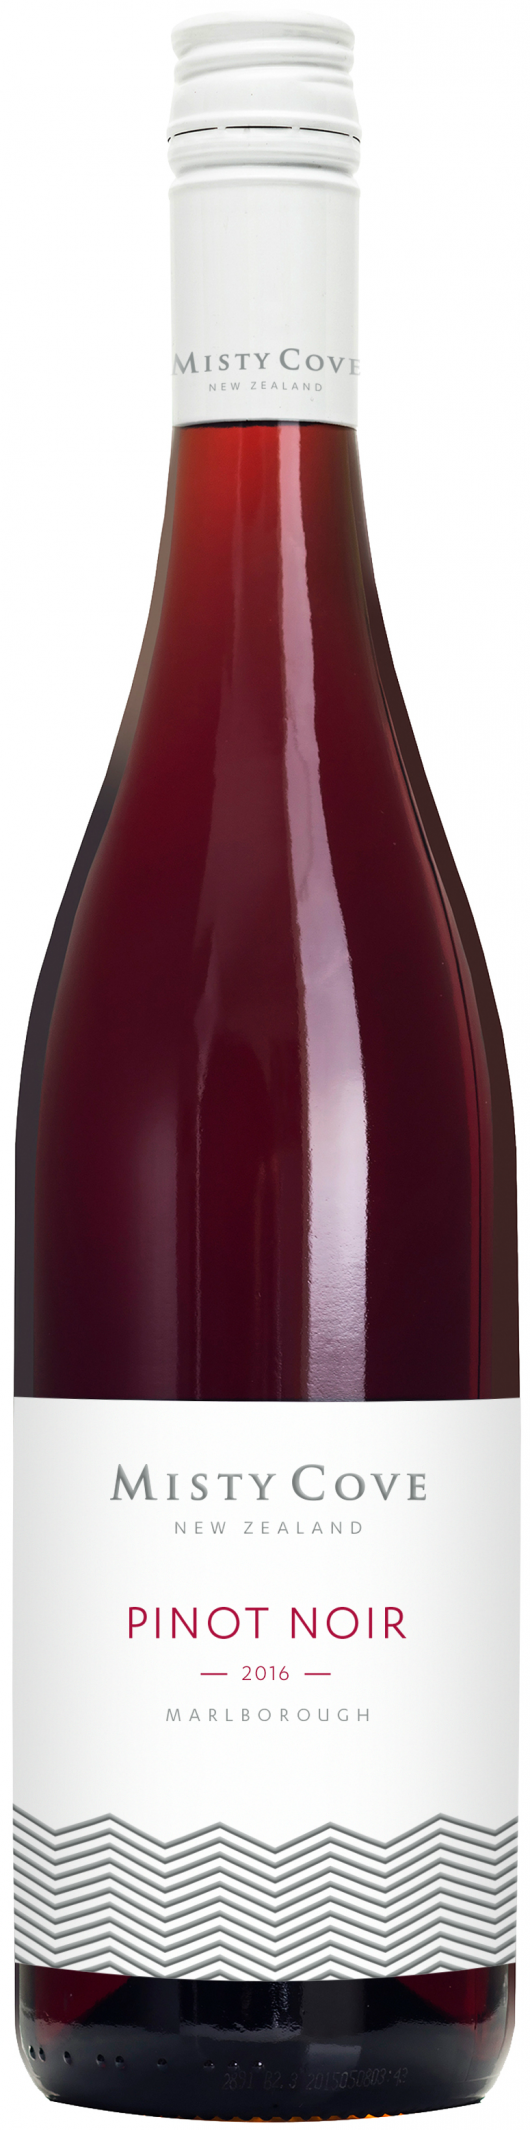 Misty Cove 'Estate' Pinot Noir 2016-0